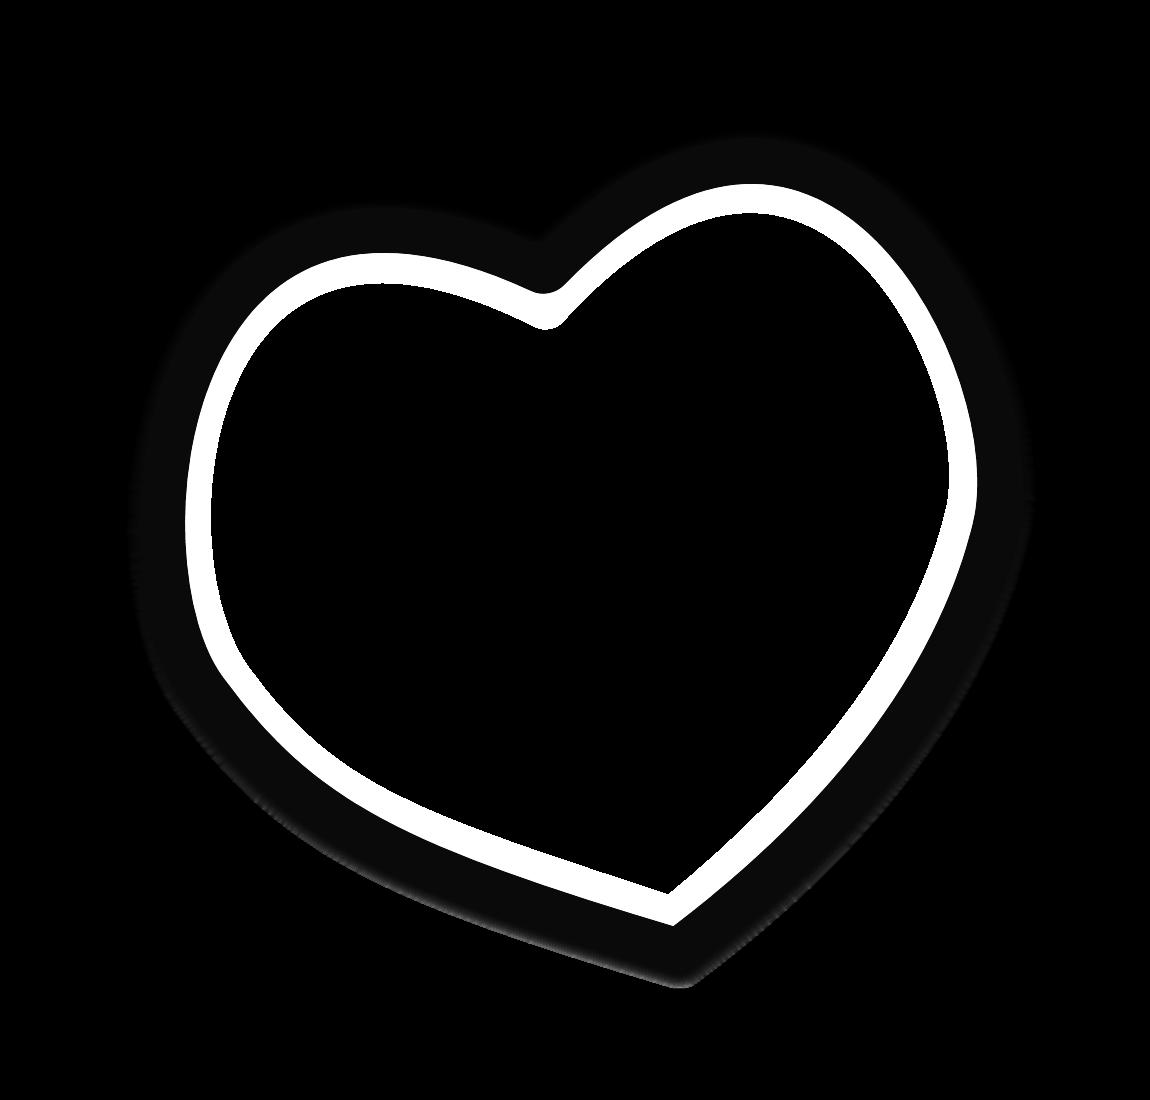 Black heart clip art clipart 3